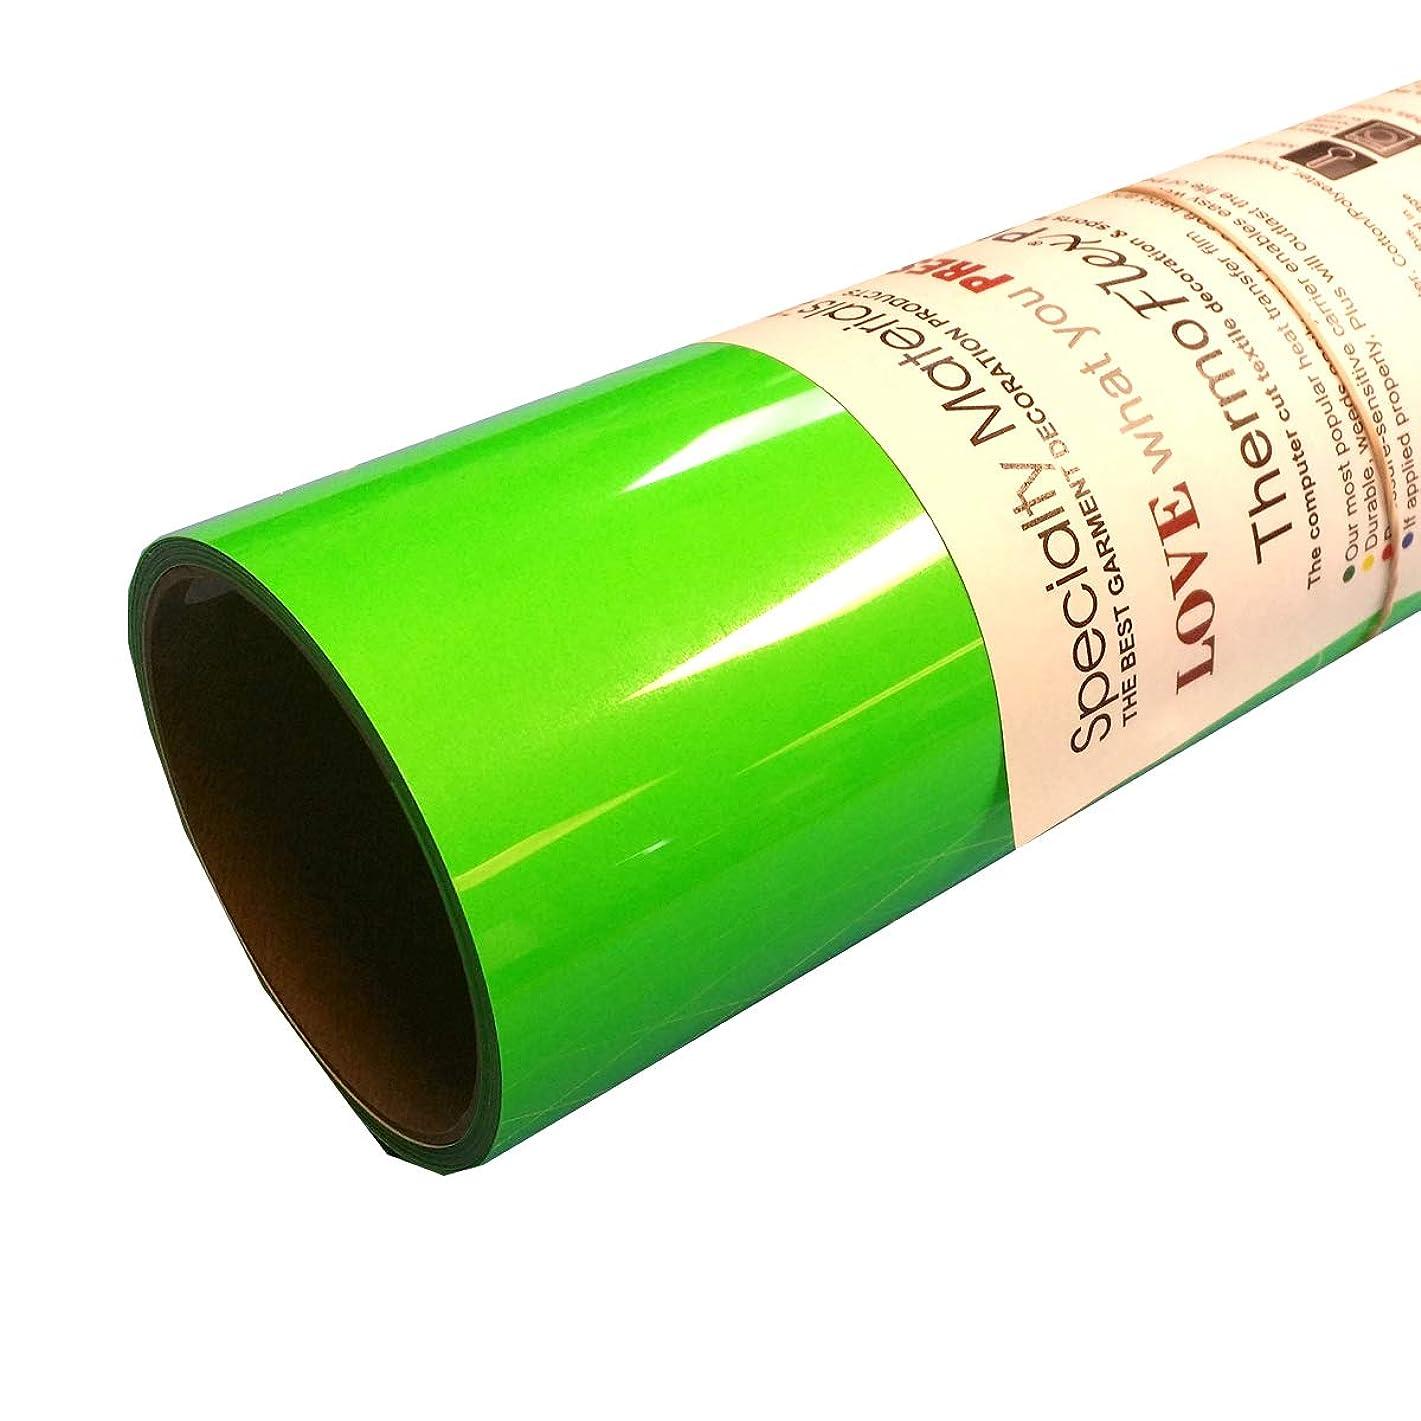 ThermoFlex Plus Neon Green 15